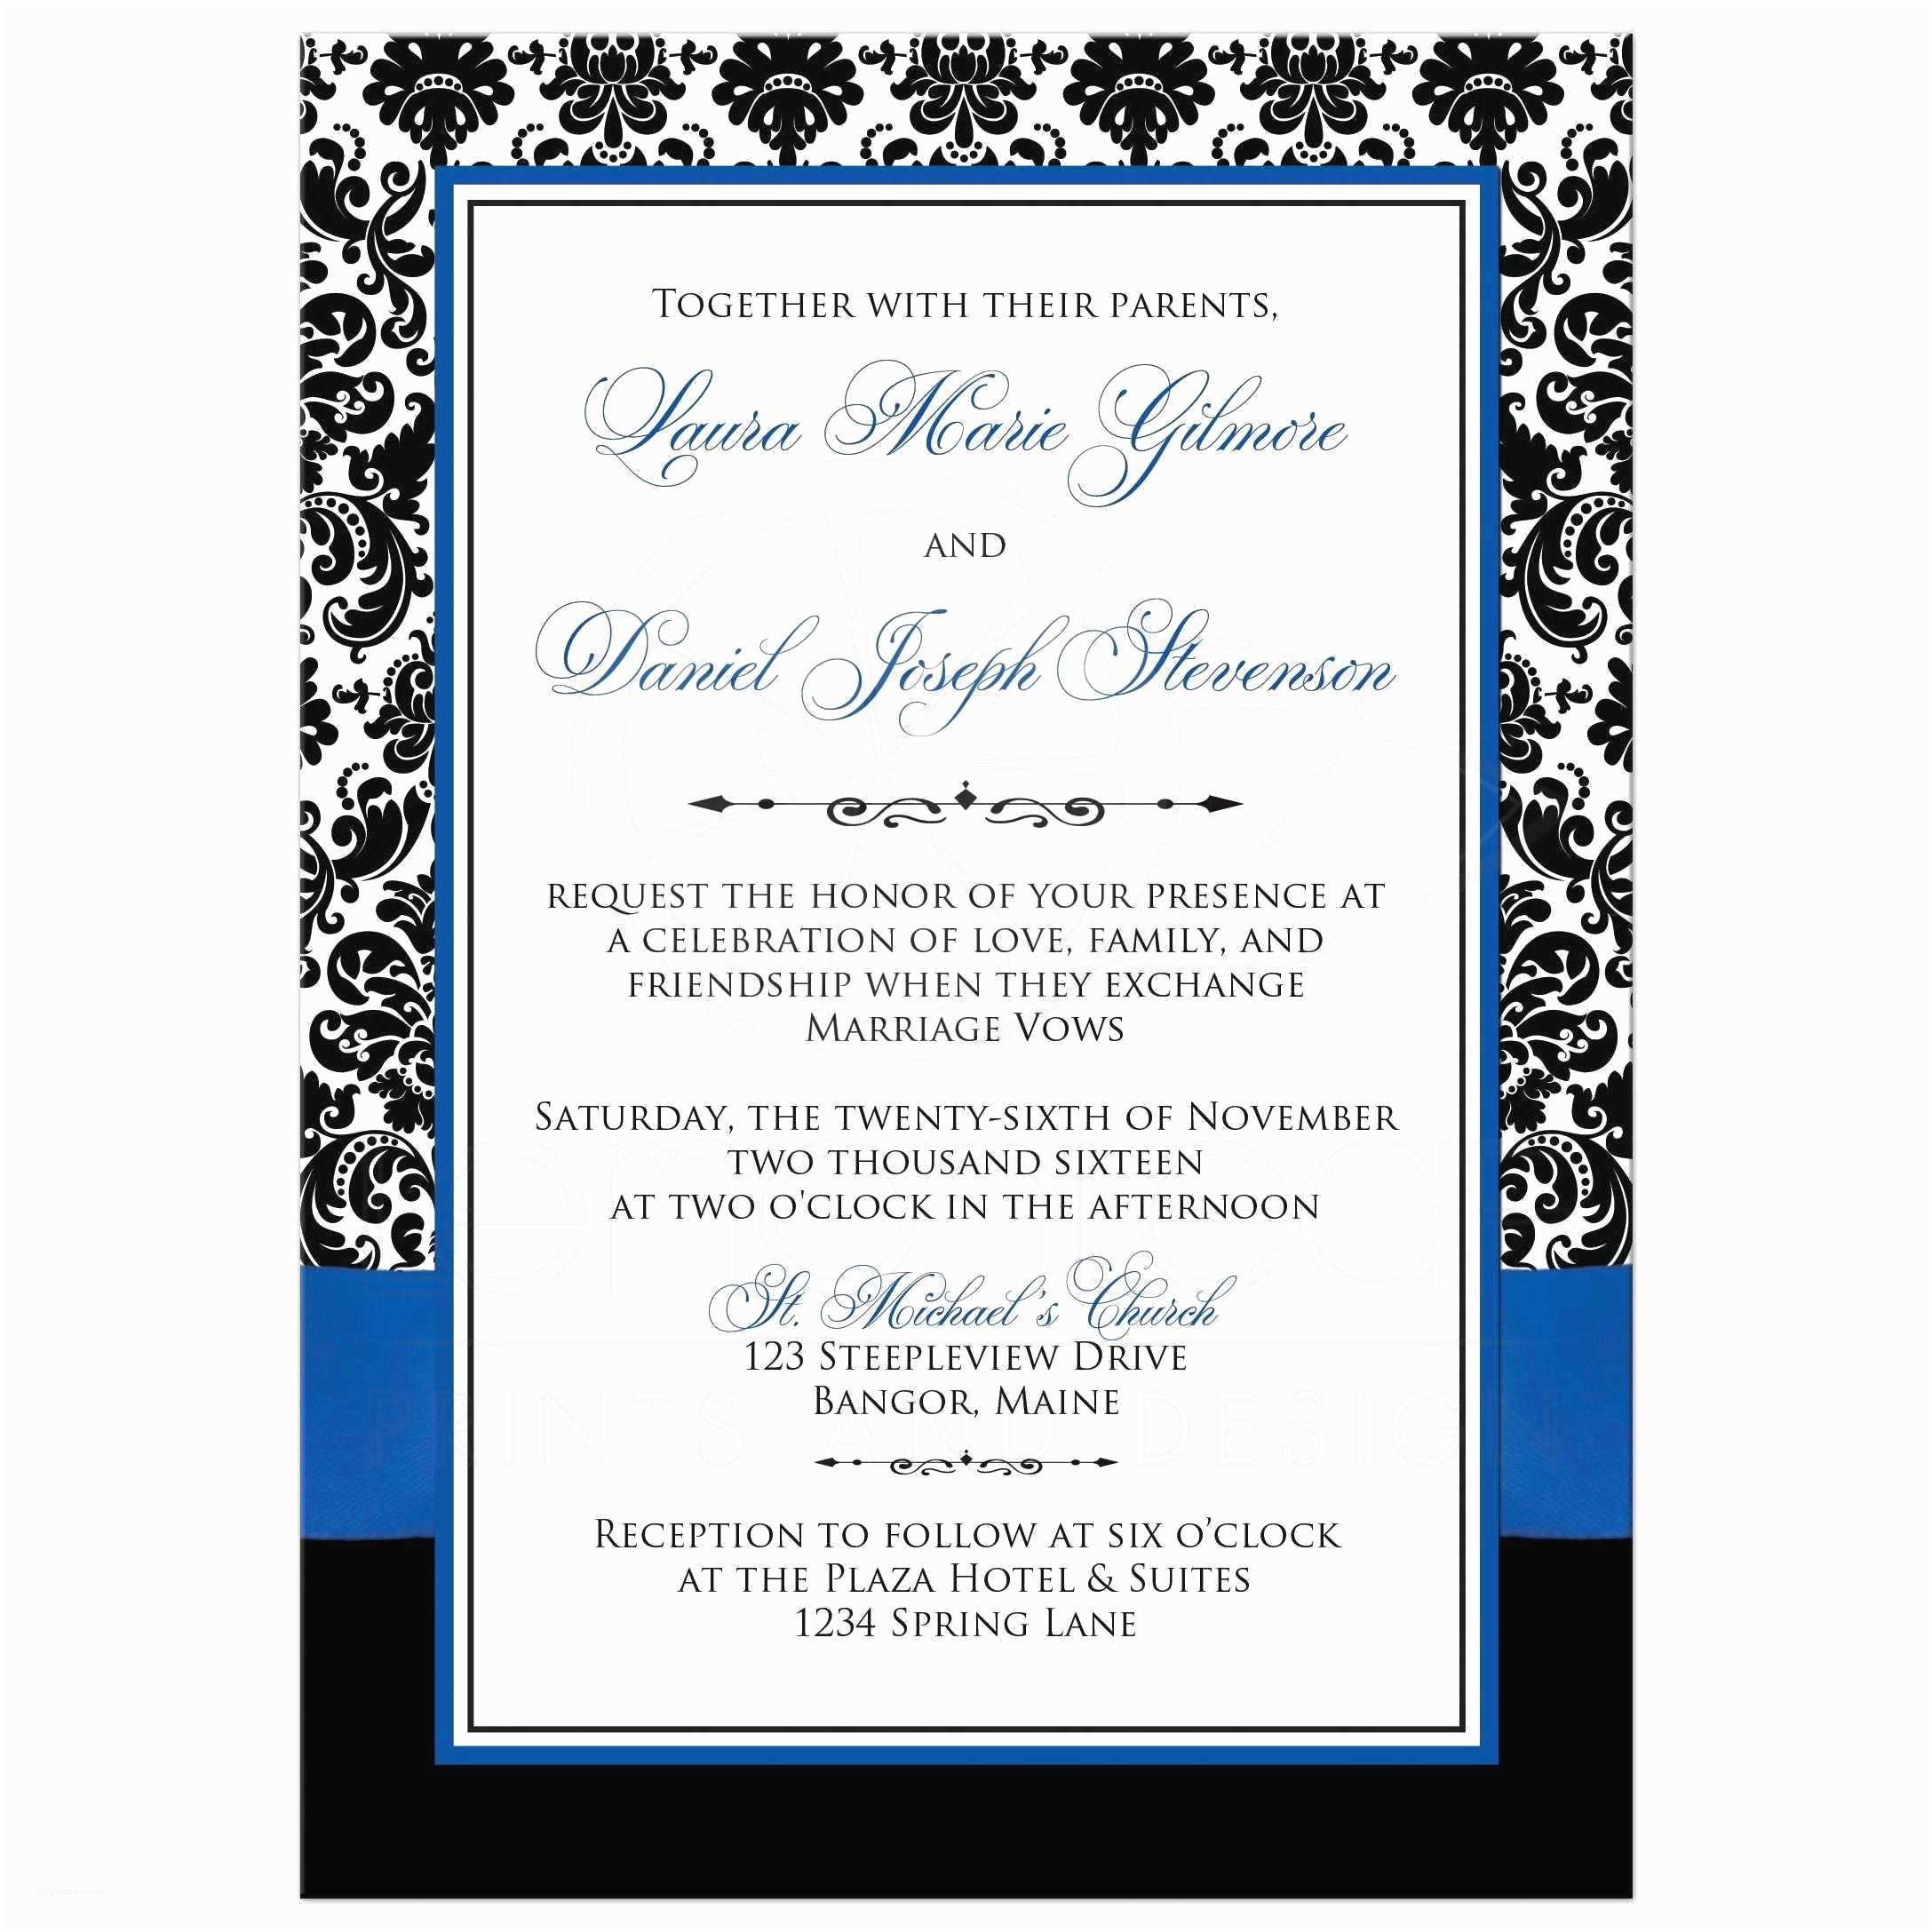 Royal Blue and Black Wedding Invitations Photo Template Wedding Invitation